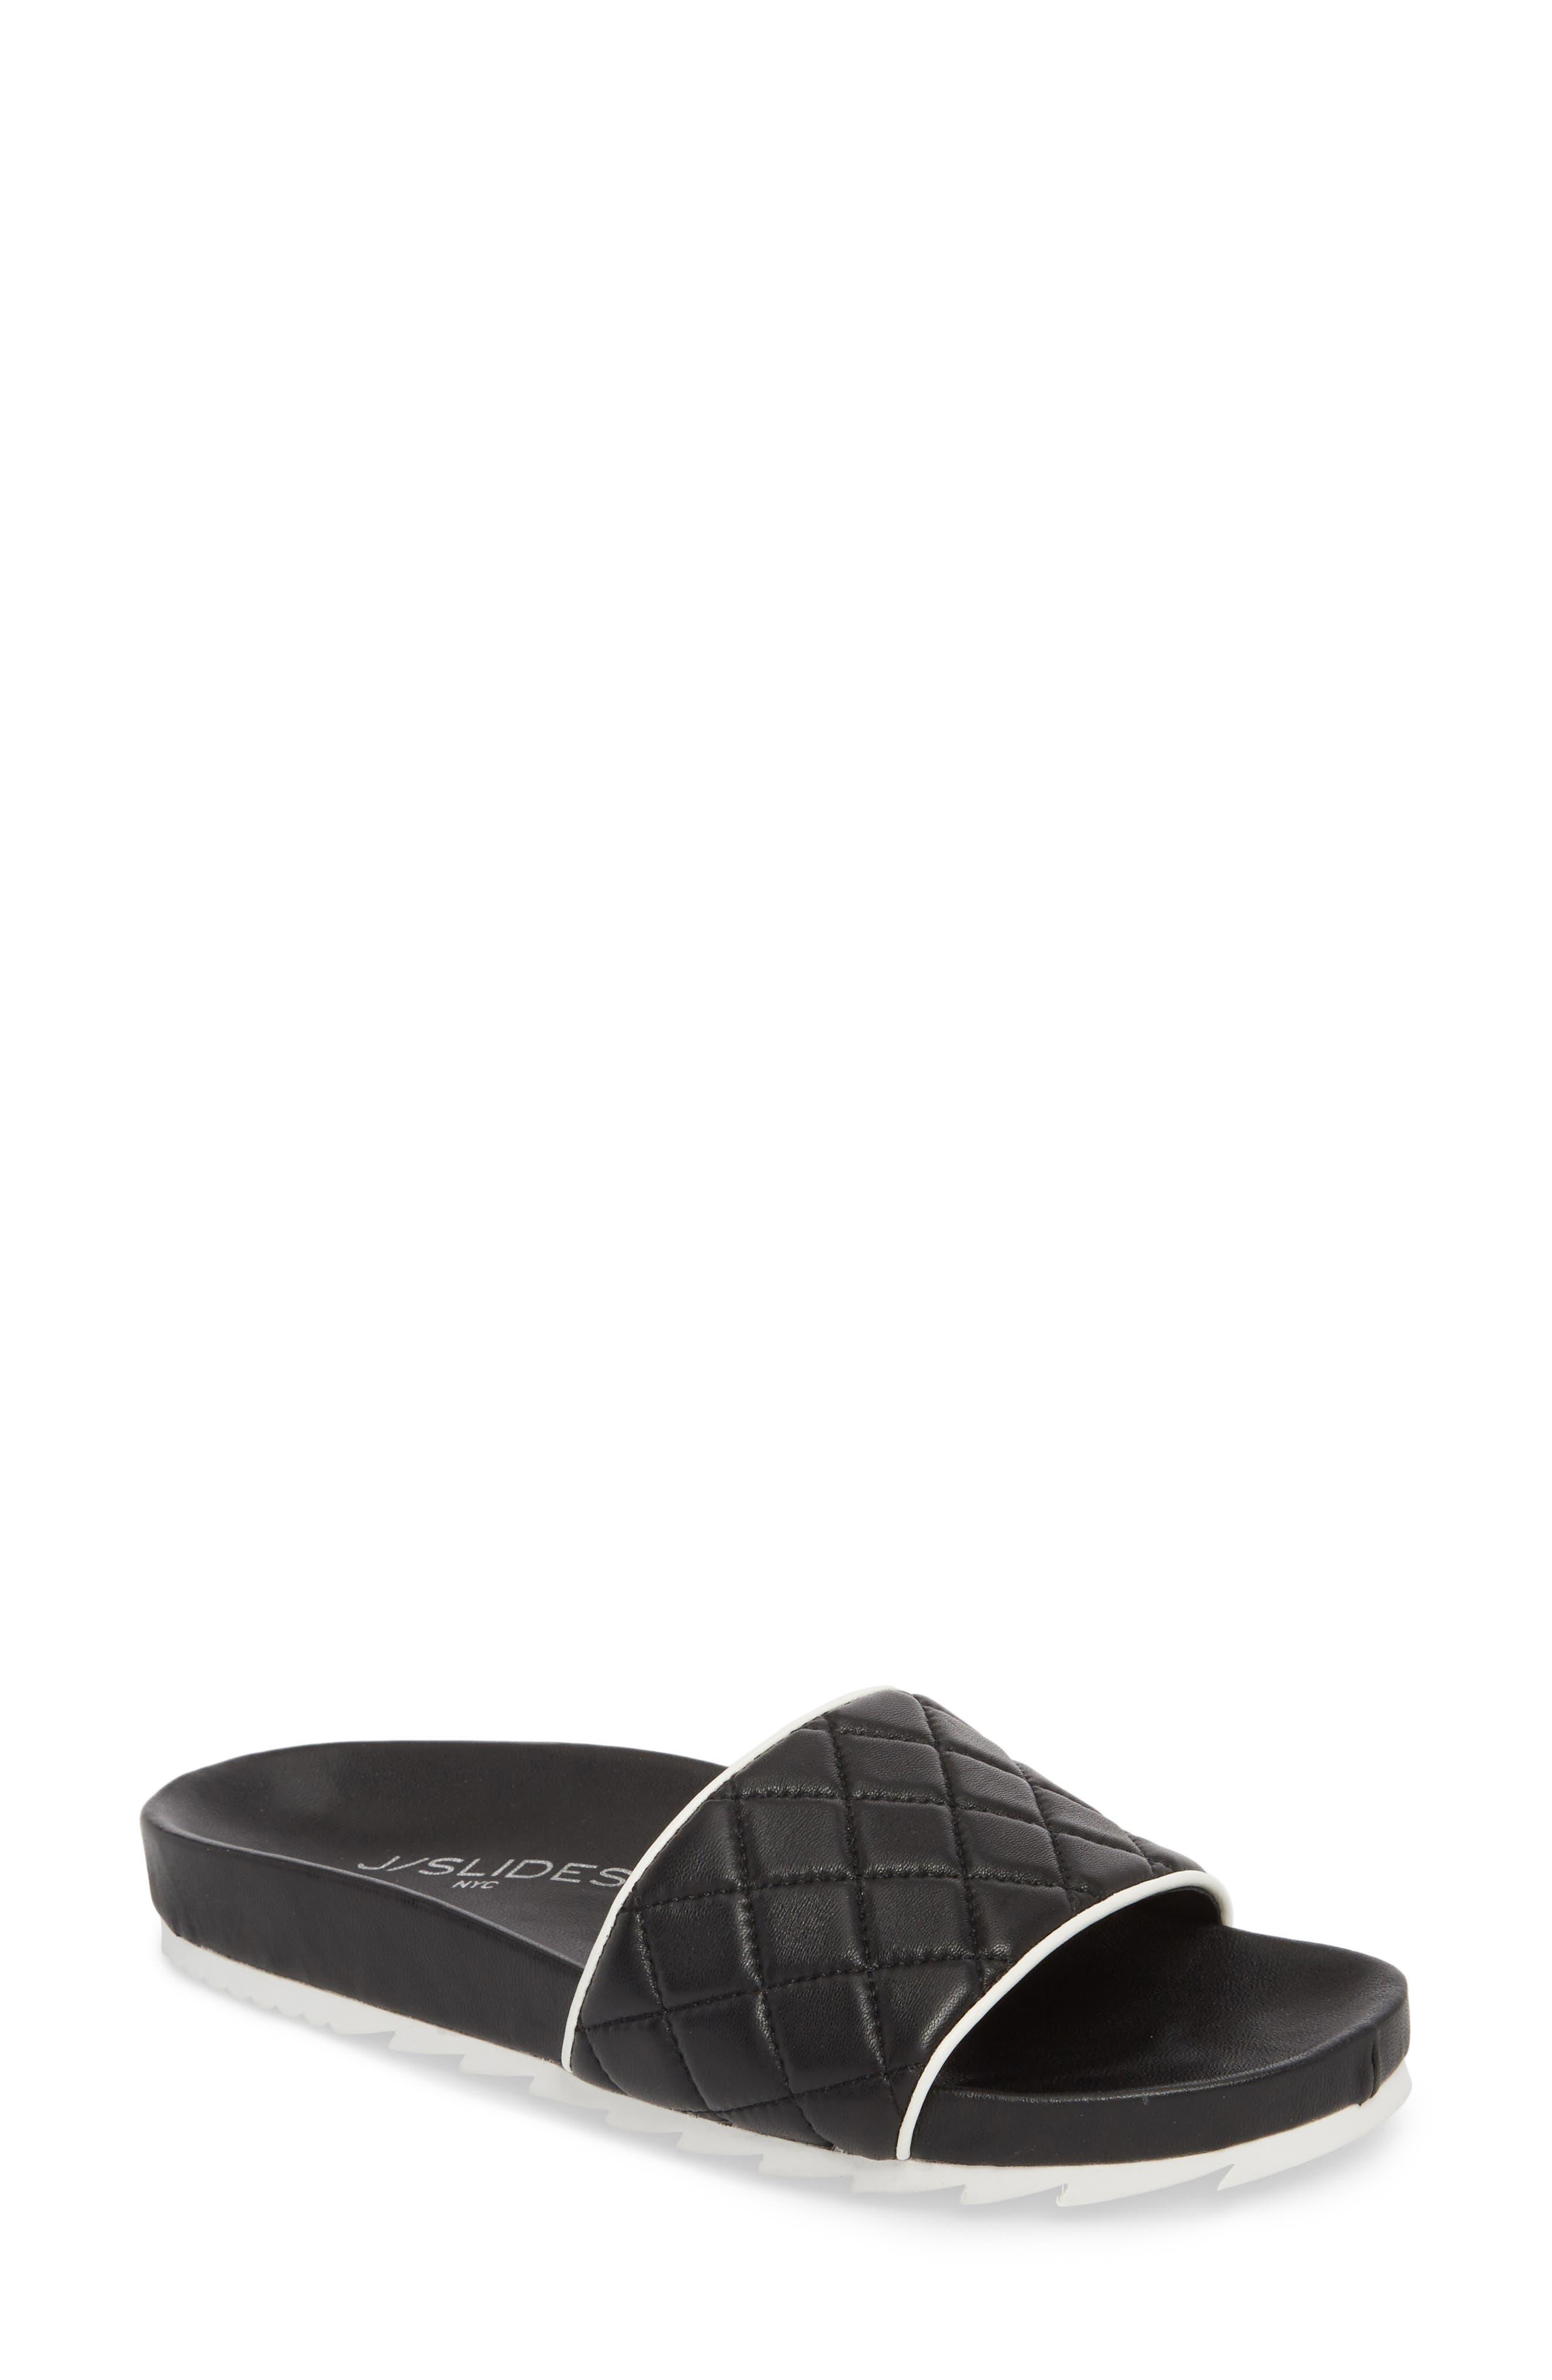 Edge Slide Sandal,                             Main thumbnail 1, color,                             BLACK LEATHER